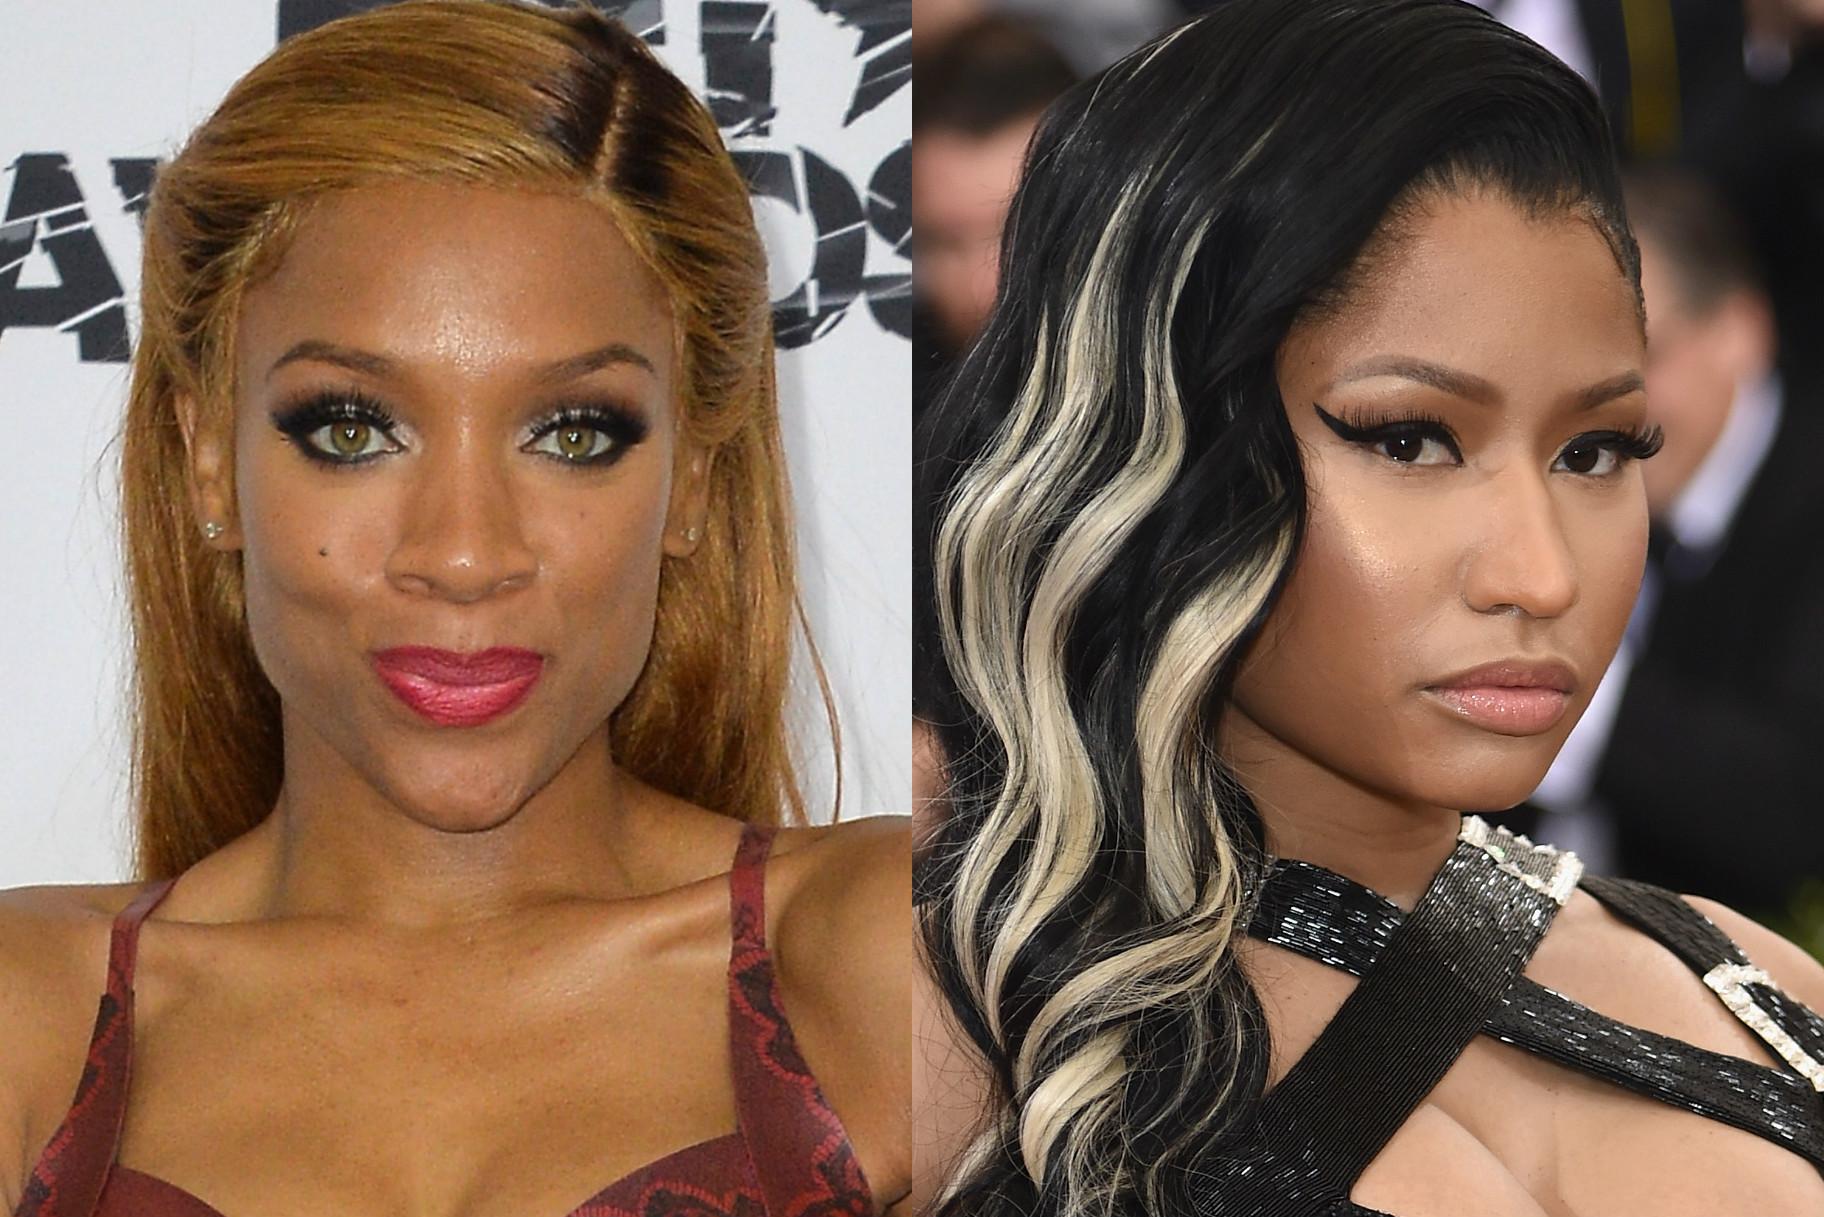 Lil Mama Just Threw Shade At Nicki MinajAnd Brought Lil